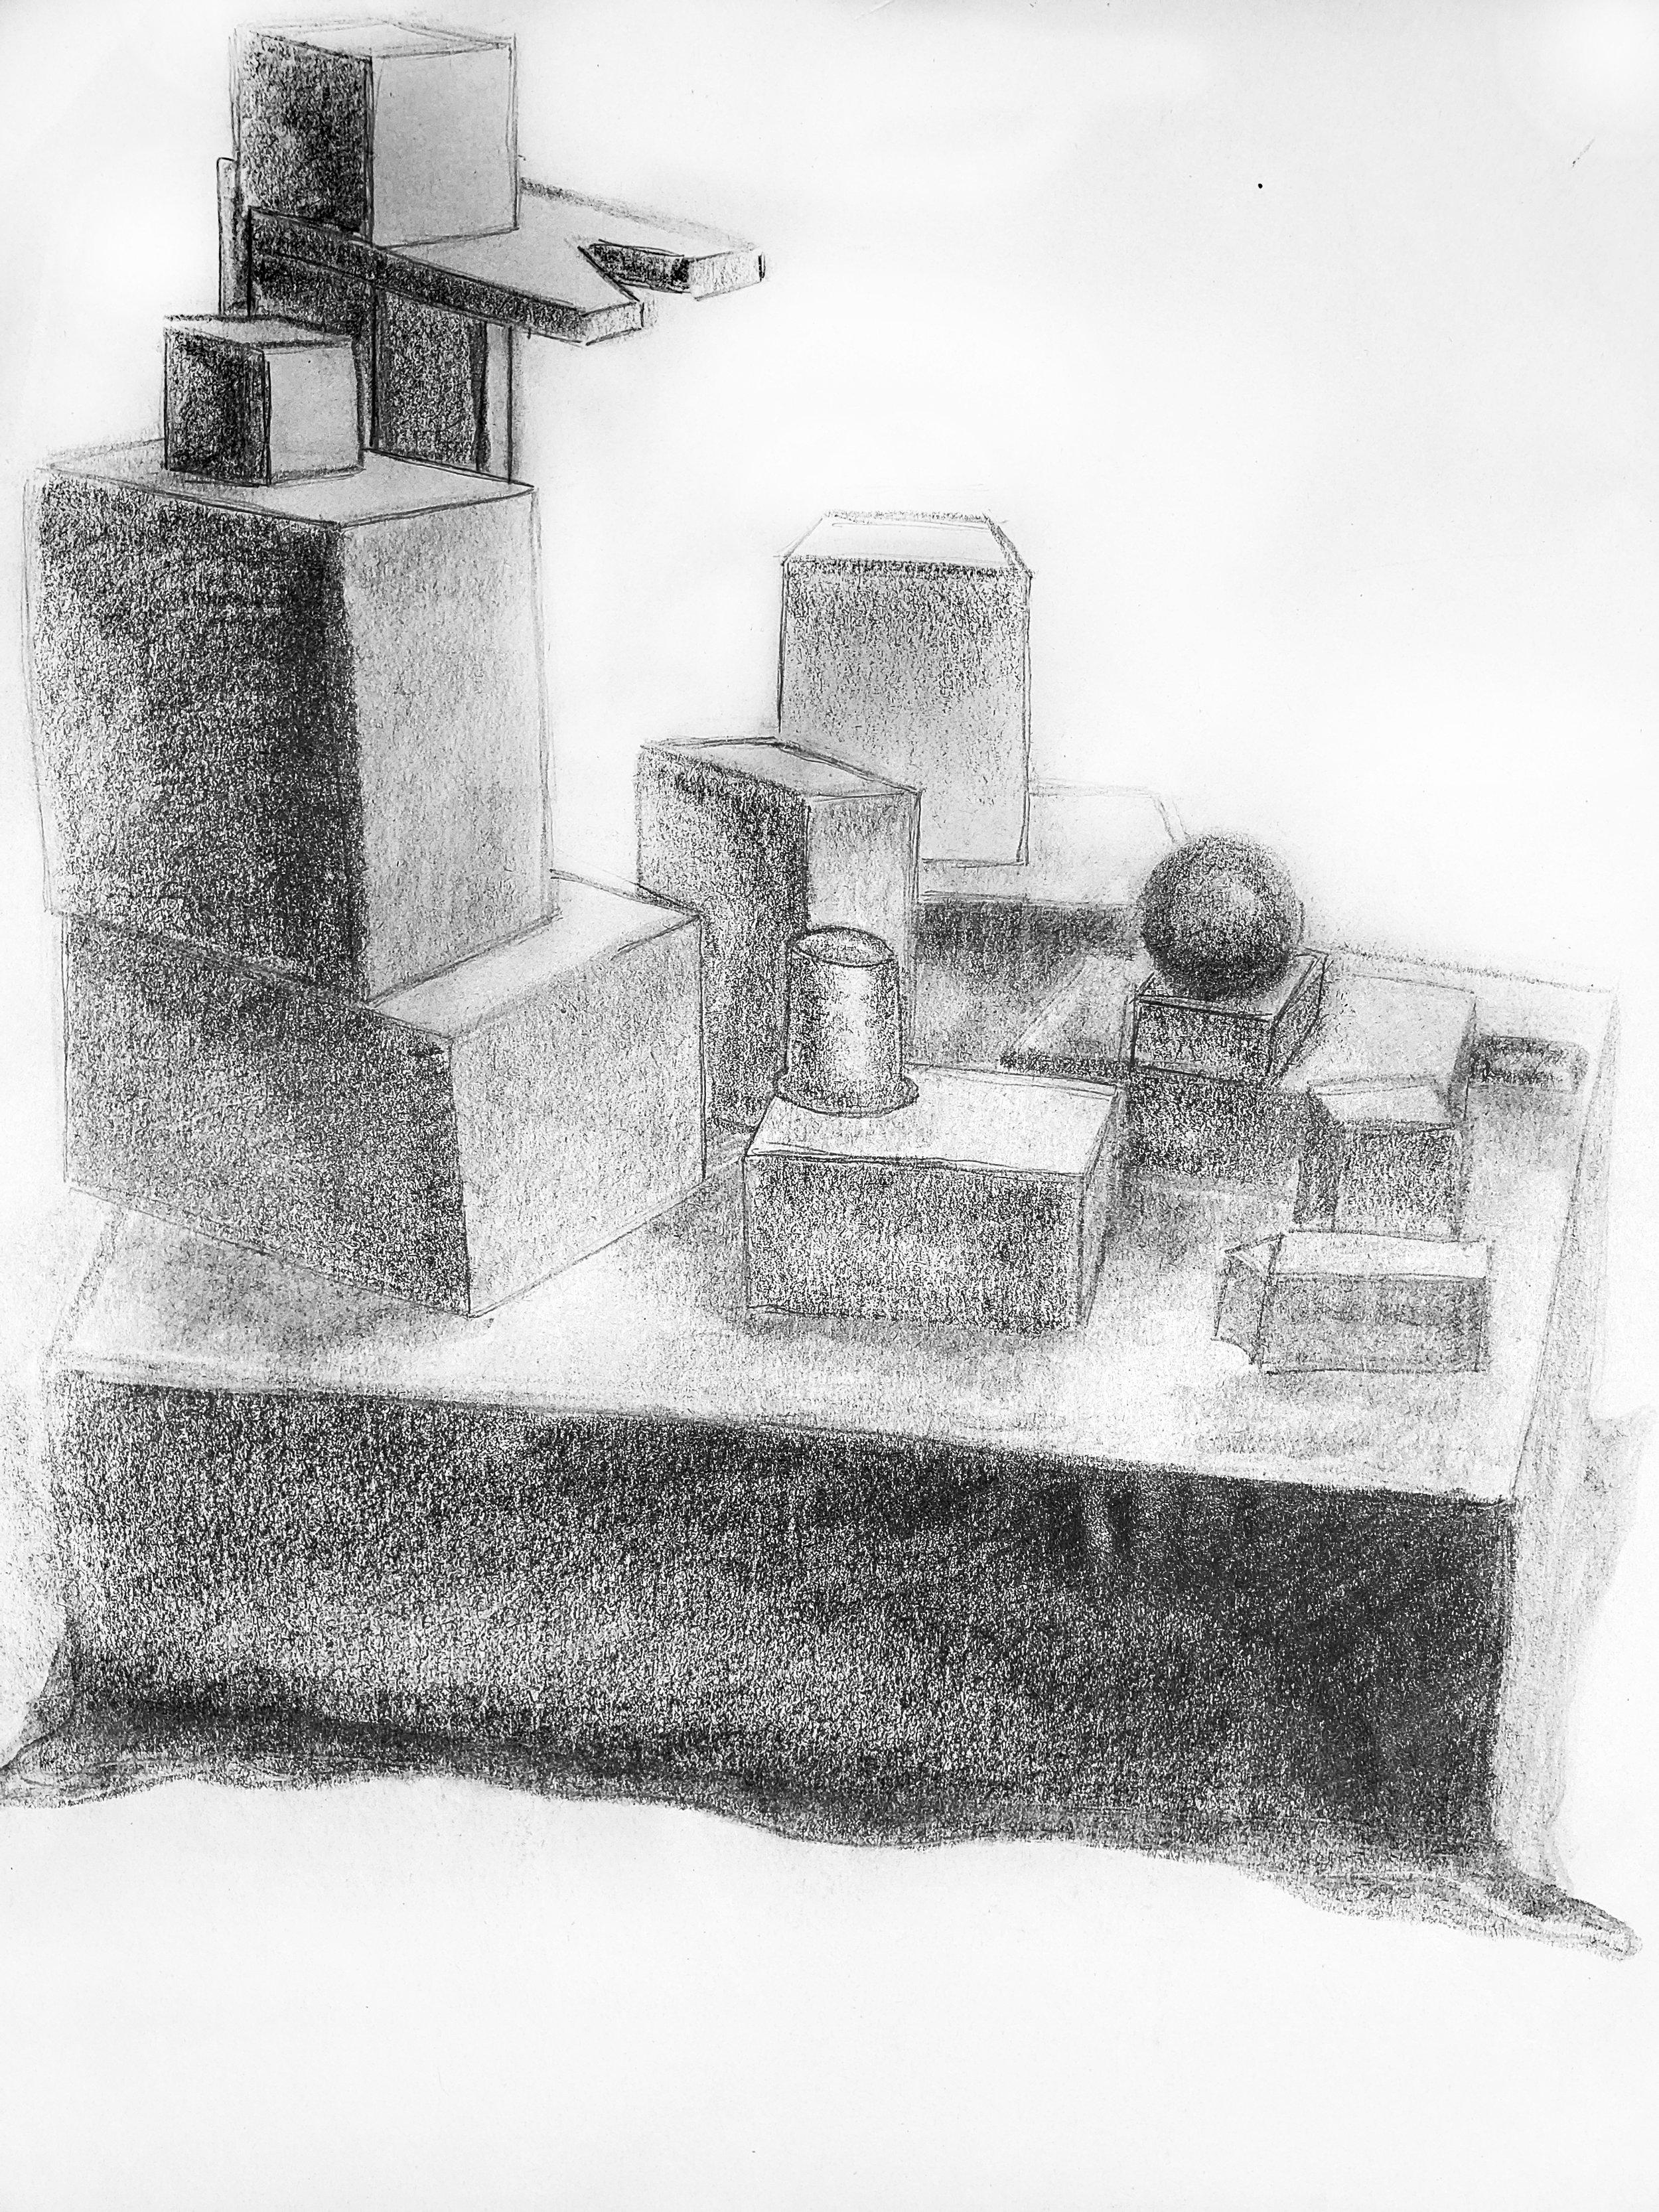 Sizing/Shading Study - Beginning Drawing